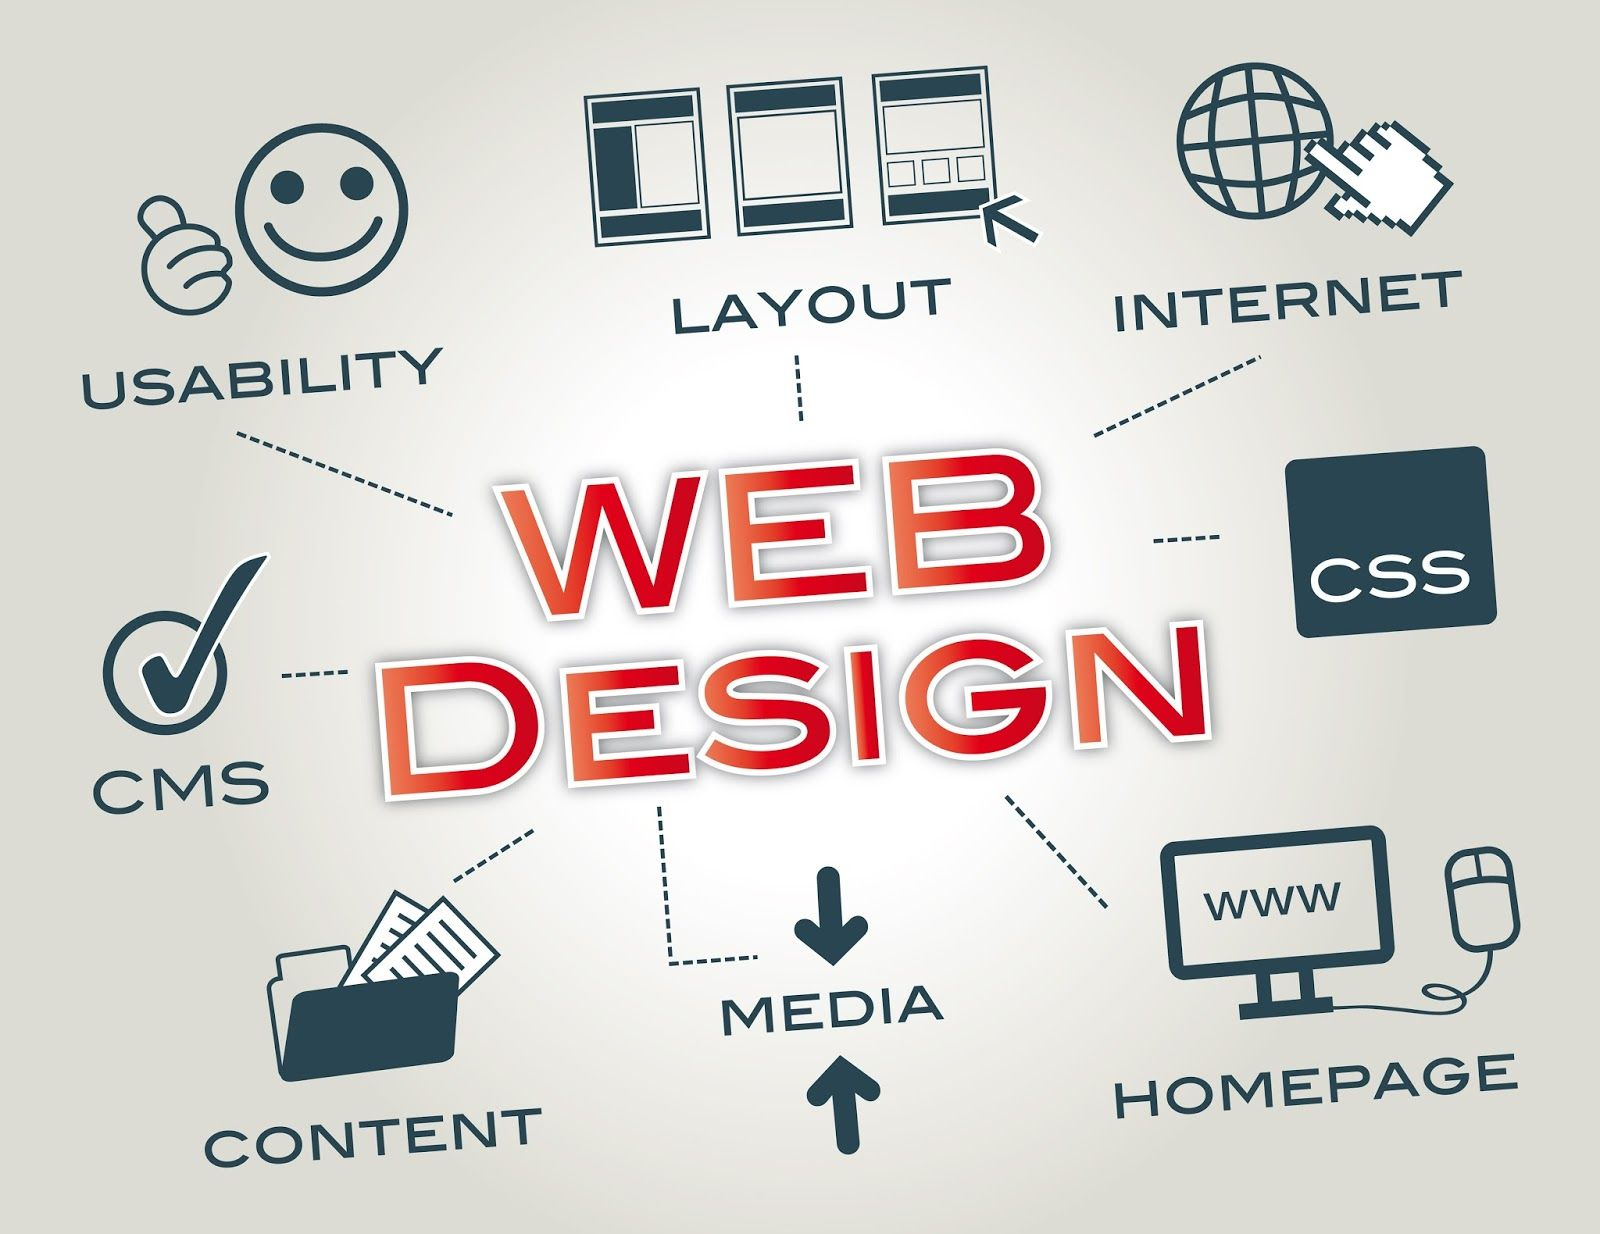 Tips For Web Design Beginners Website Design Company Website Design Services Web Design Services